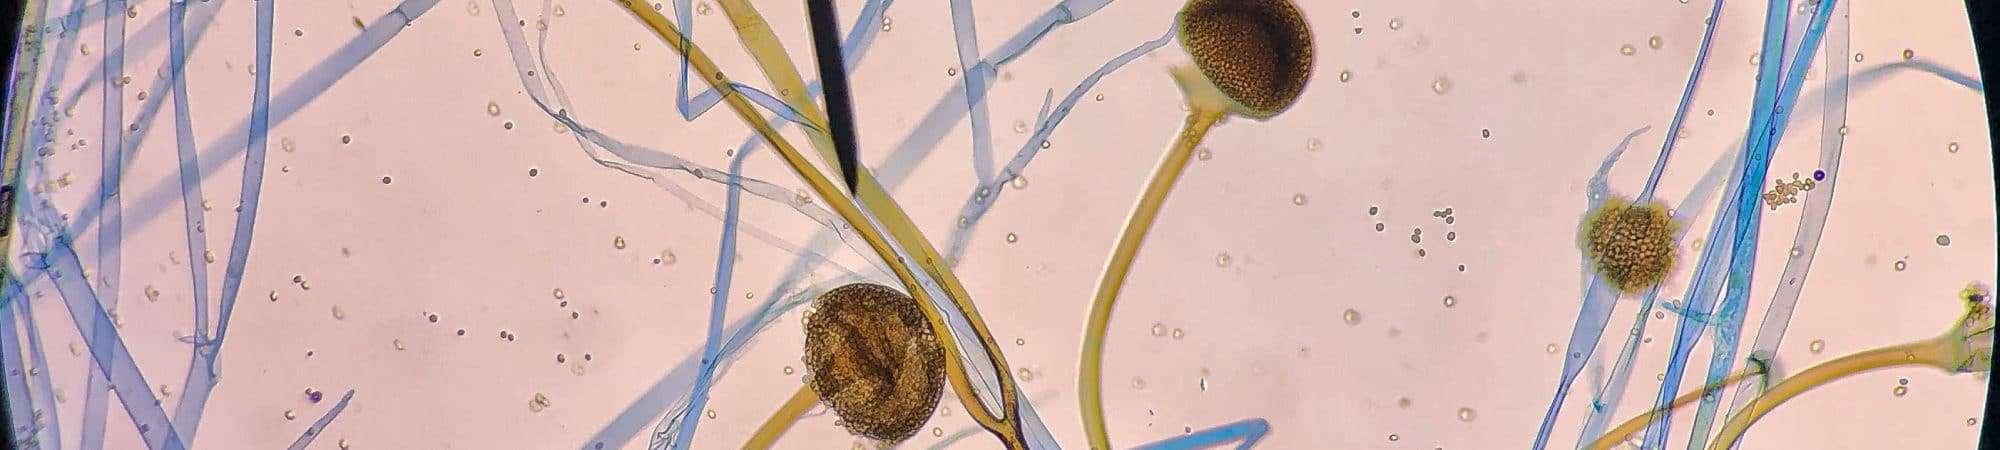 Fungo 'Rhizopus Oryzae' visto em microscópico